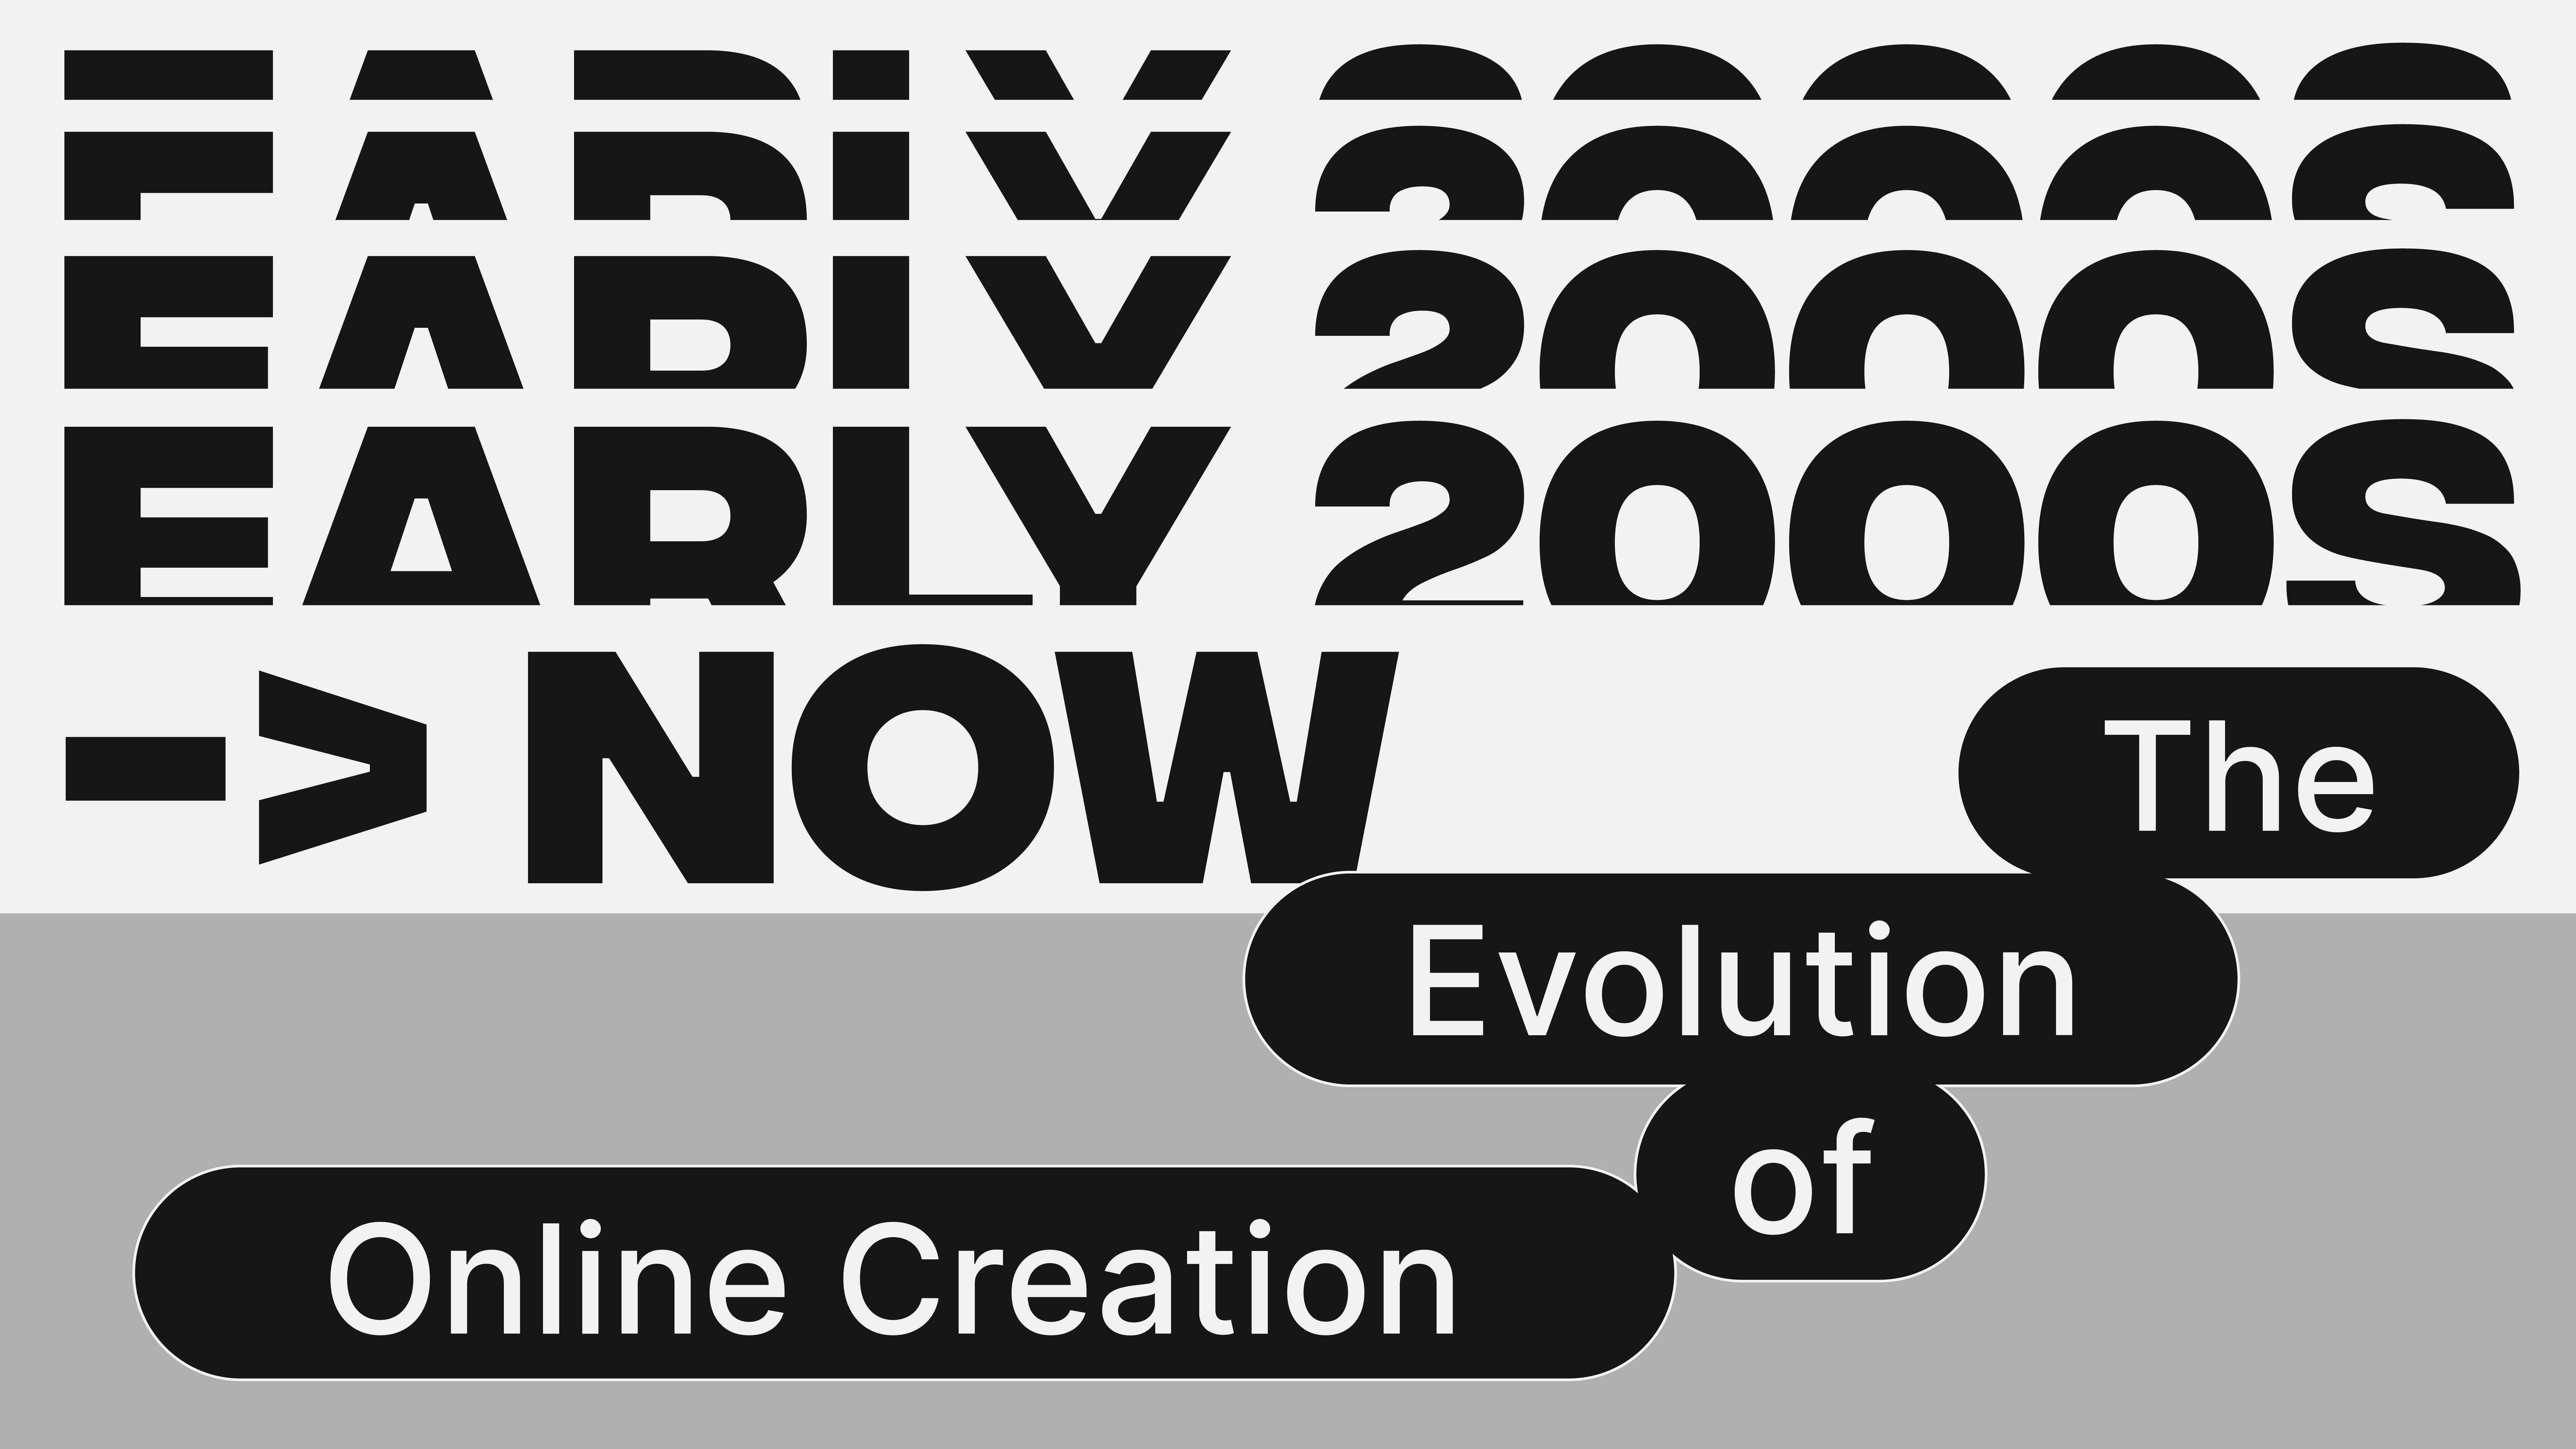 Evolution-of-Online-Creation-02